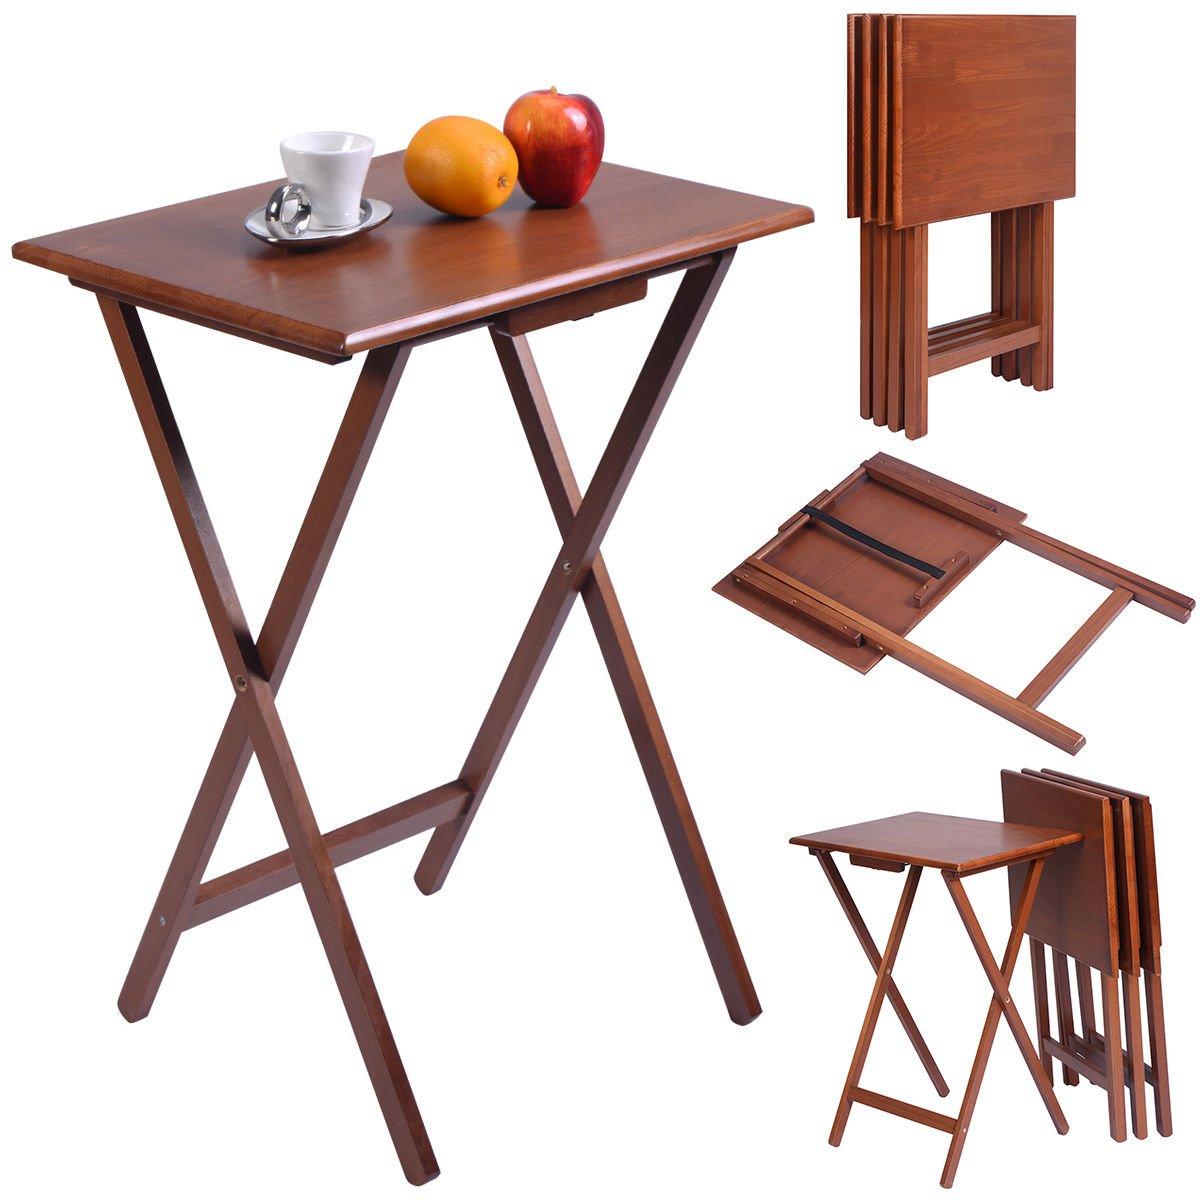 COSTWAY Set of 4 Portable Wood TV Table Folding Tray Desk Serving Furniture (Color Walnut)